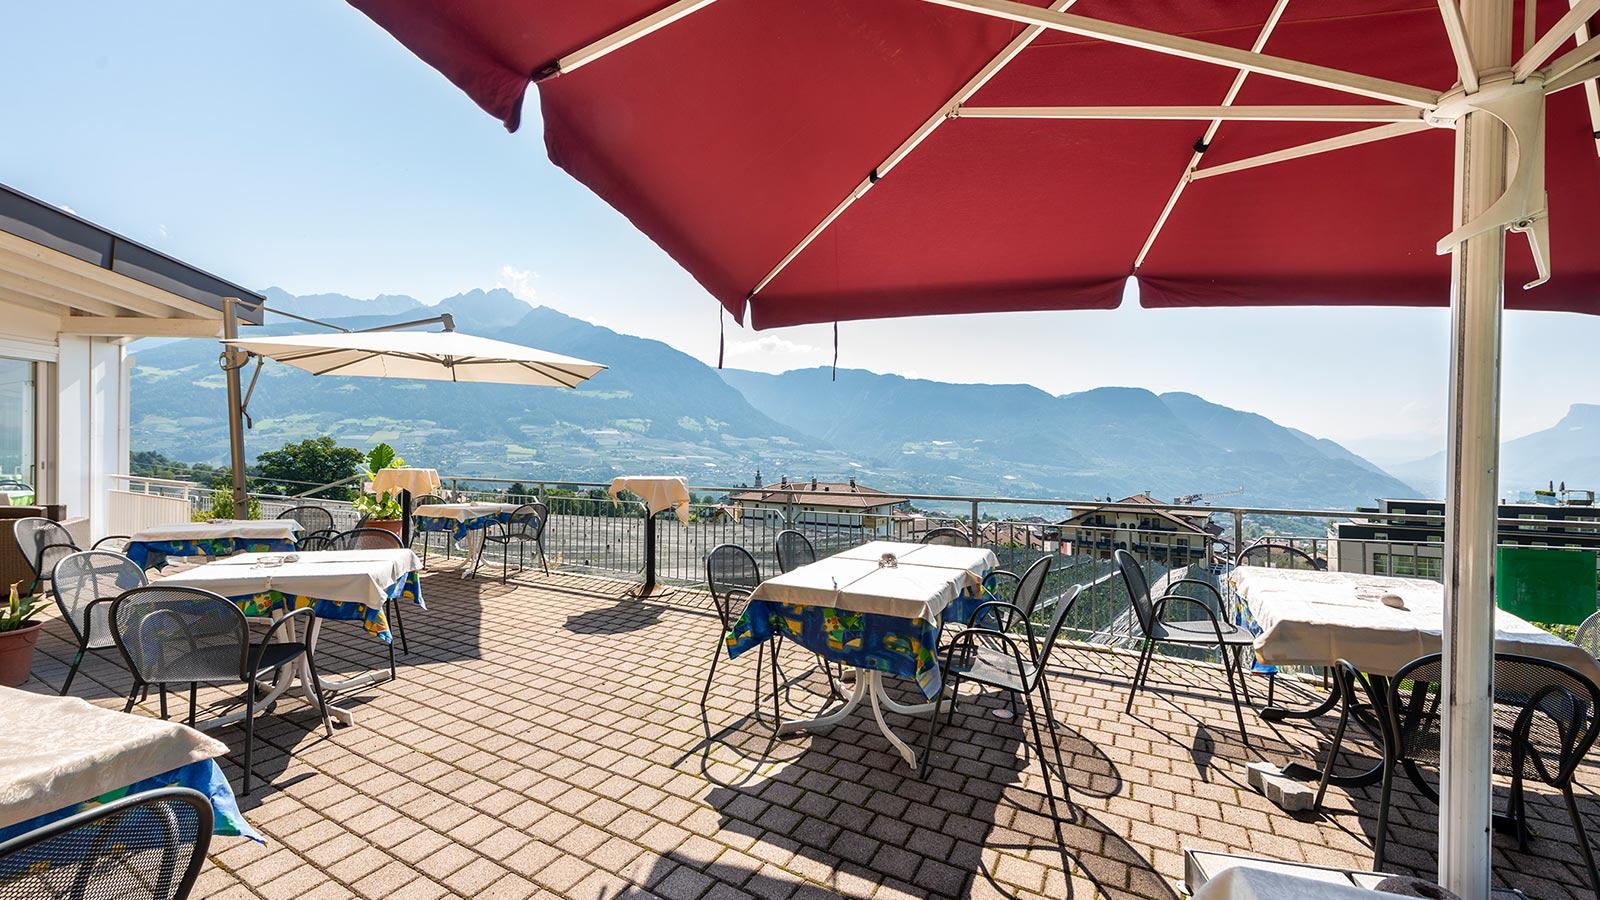 Restaurant Umgebung